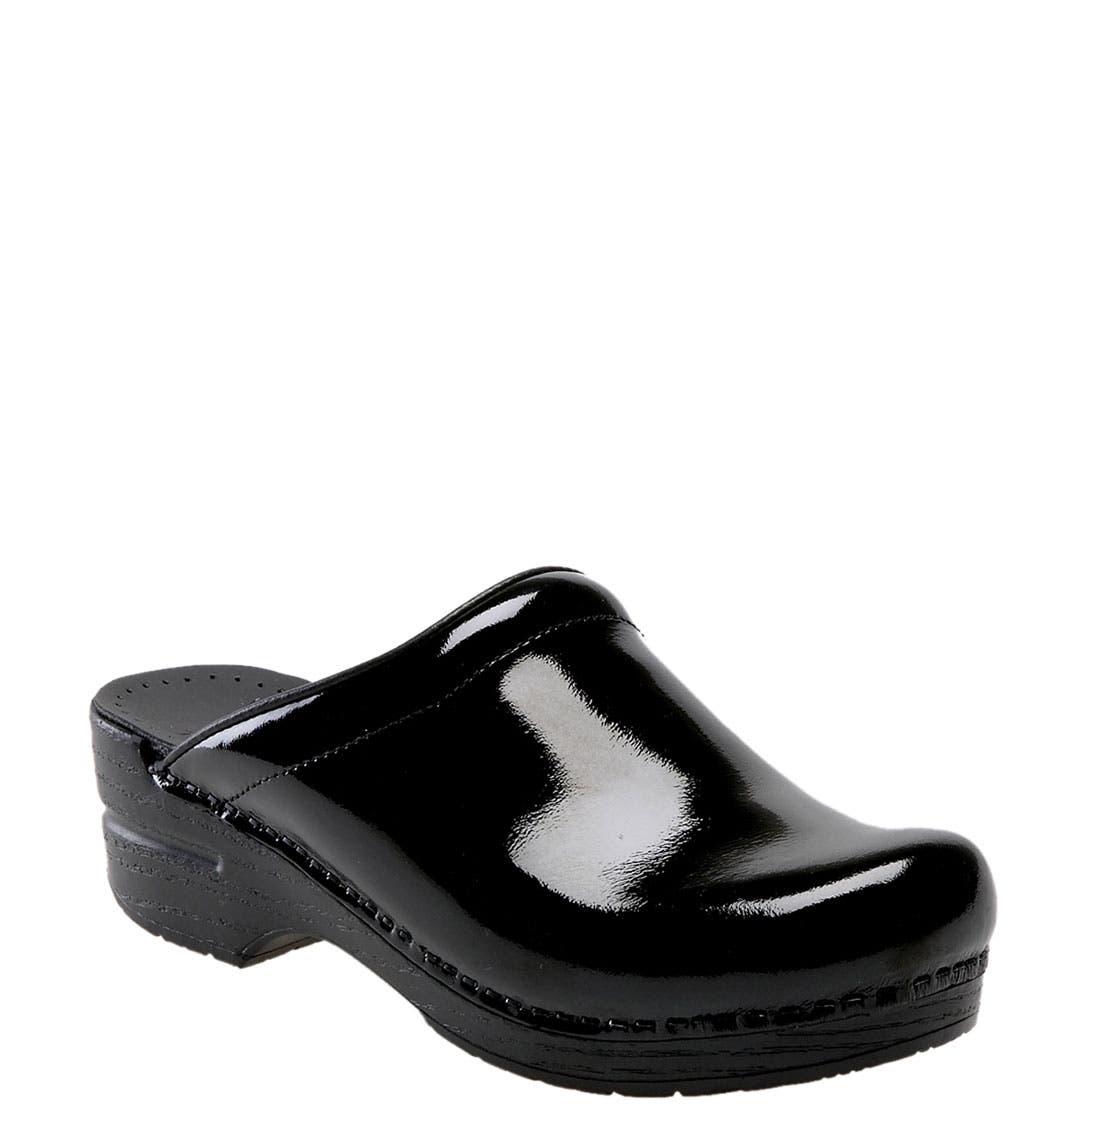 Alternate Image 1 Selected - Dansko 'Sonja' Patent Leather Clog